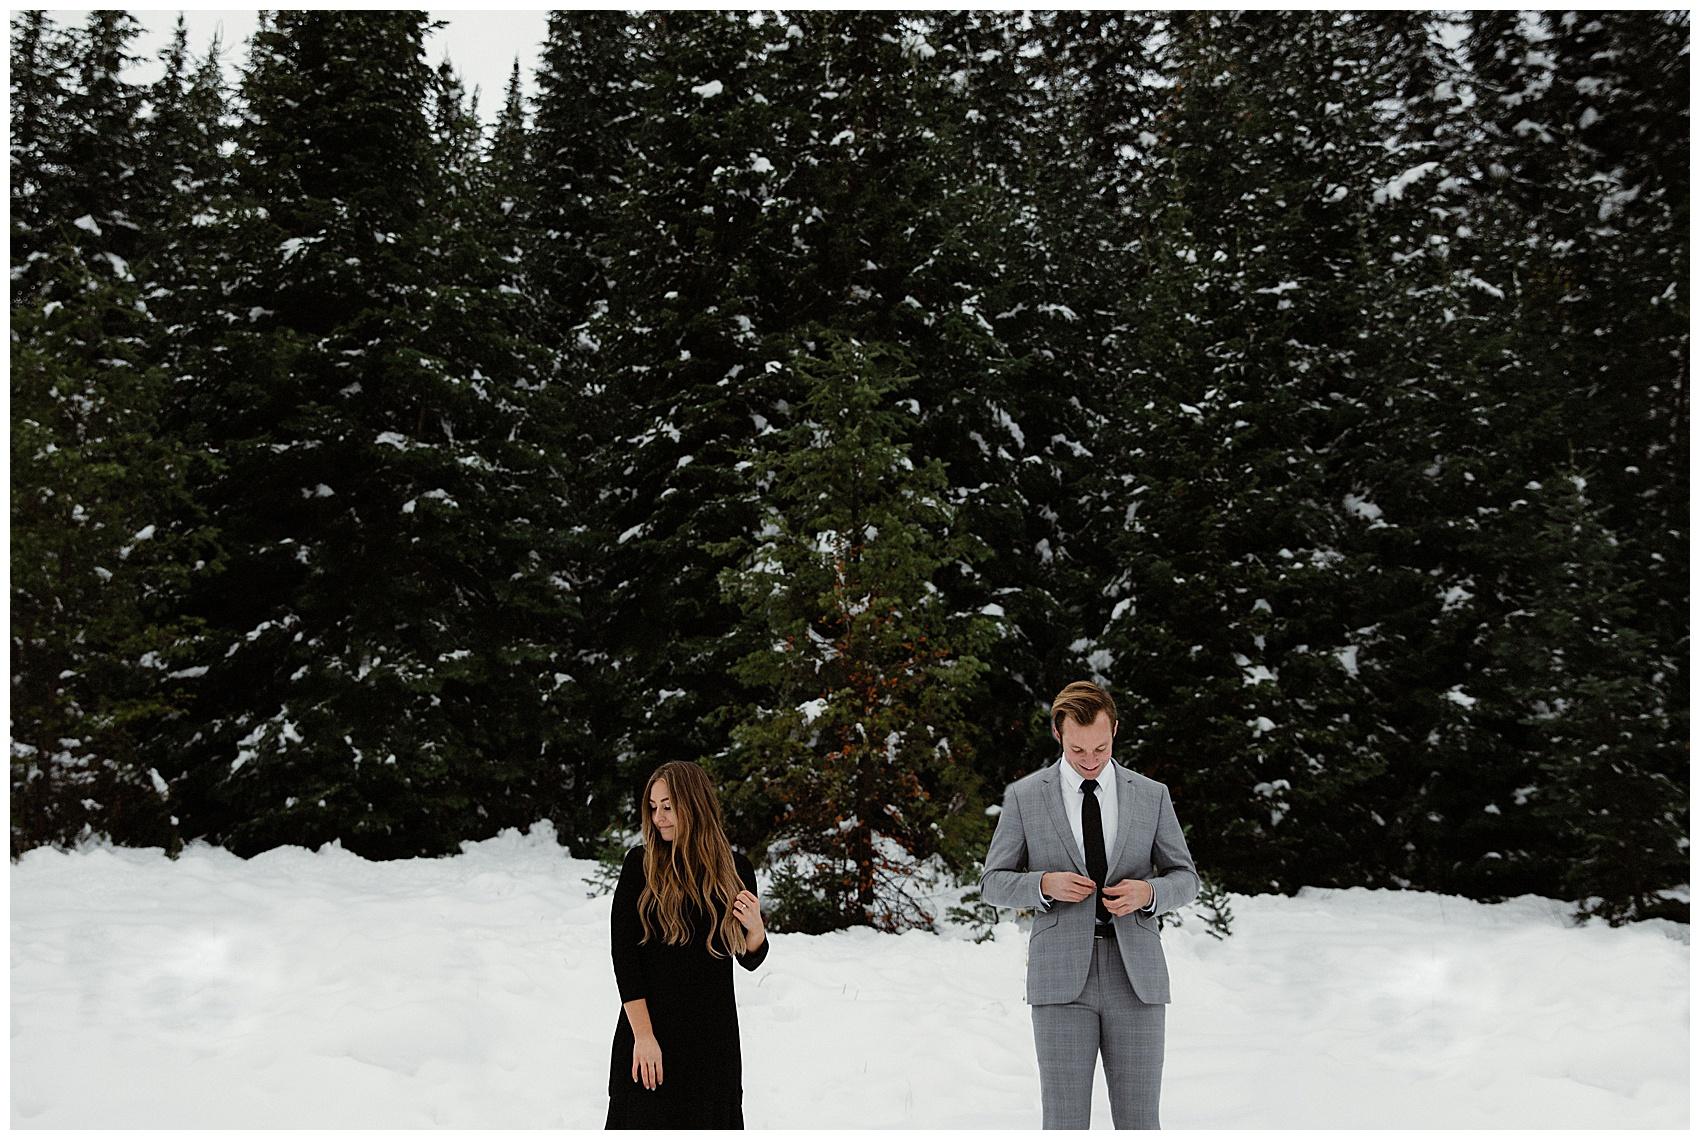 chelsea fabrizio wedding photographer in slc